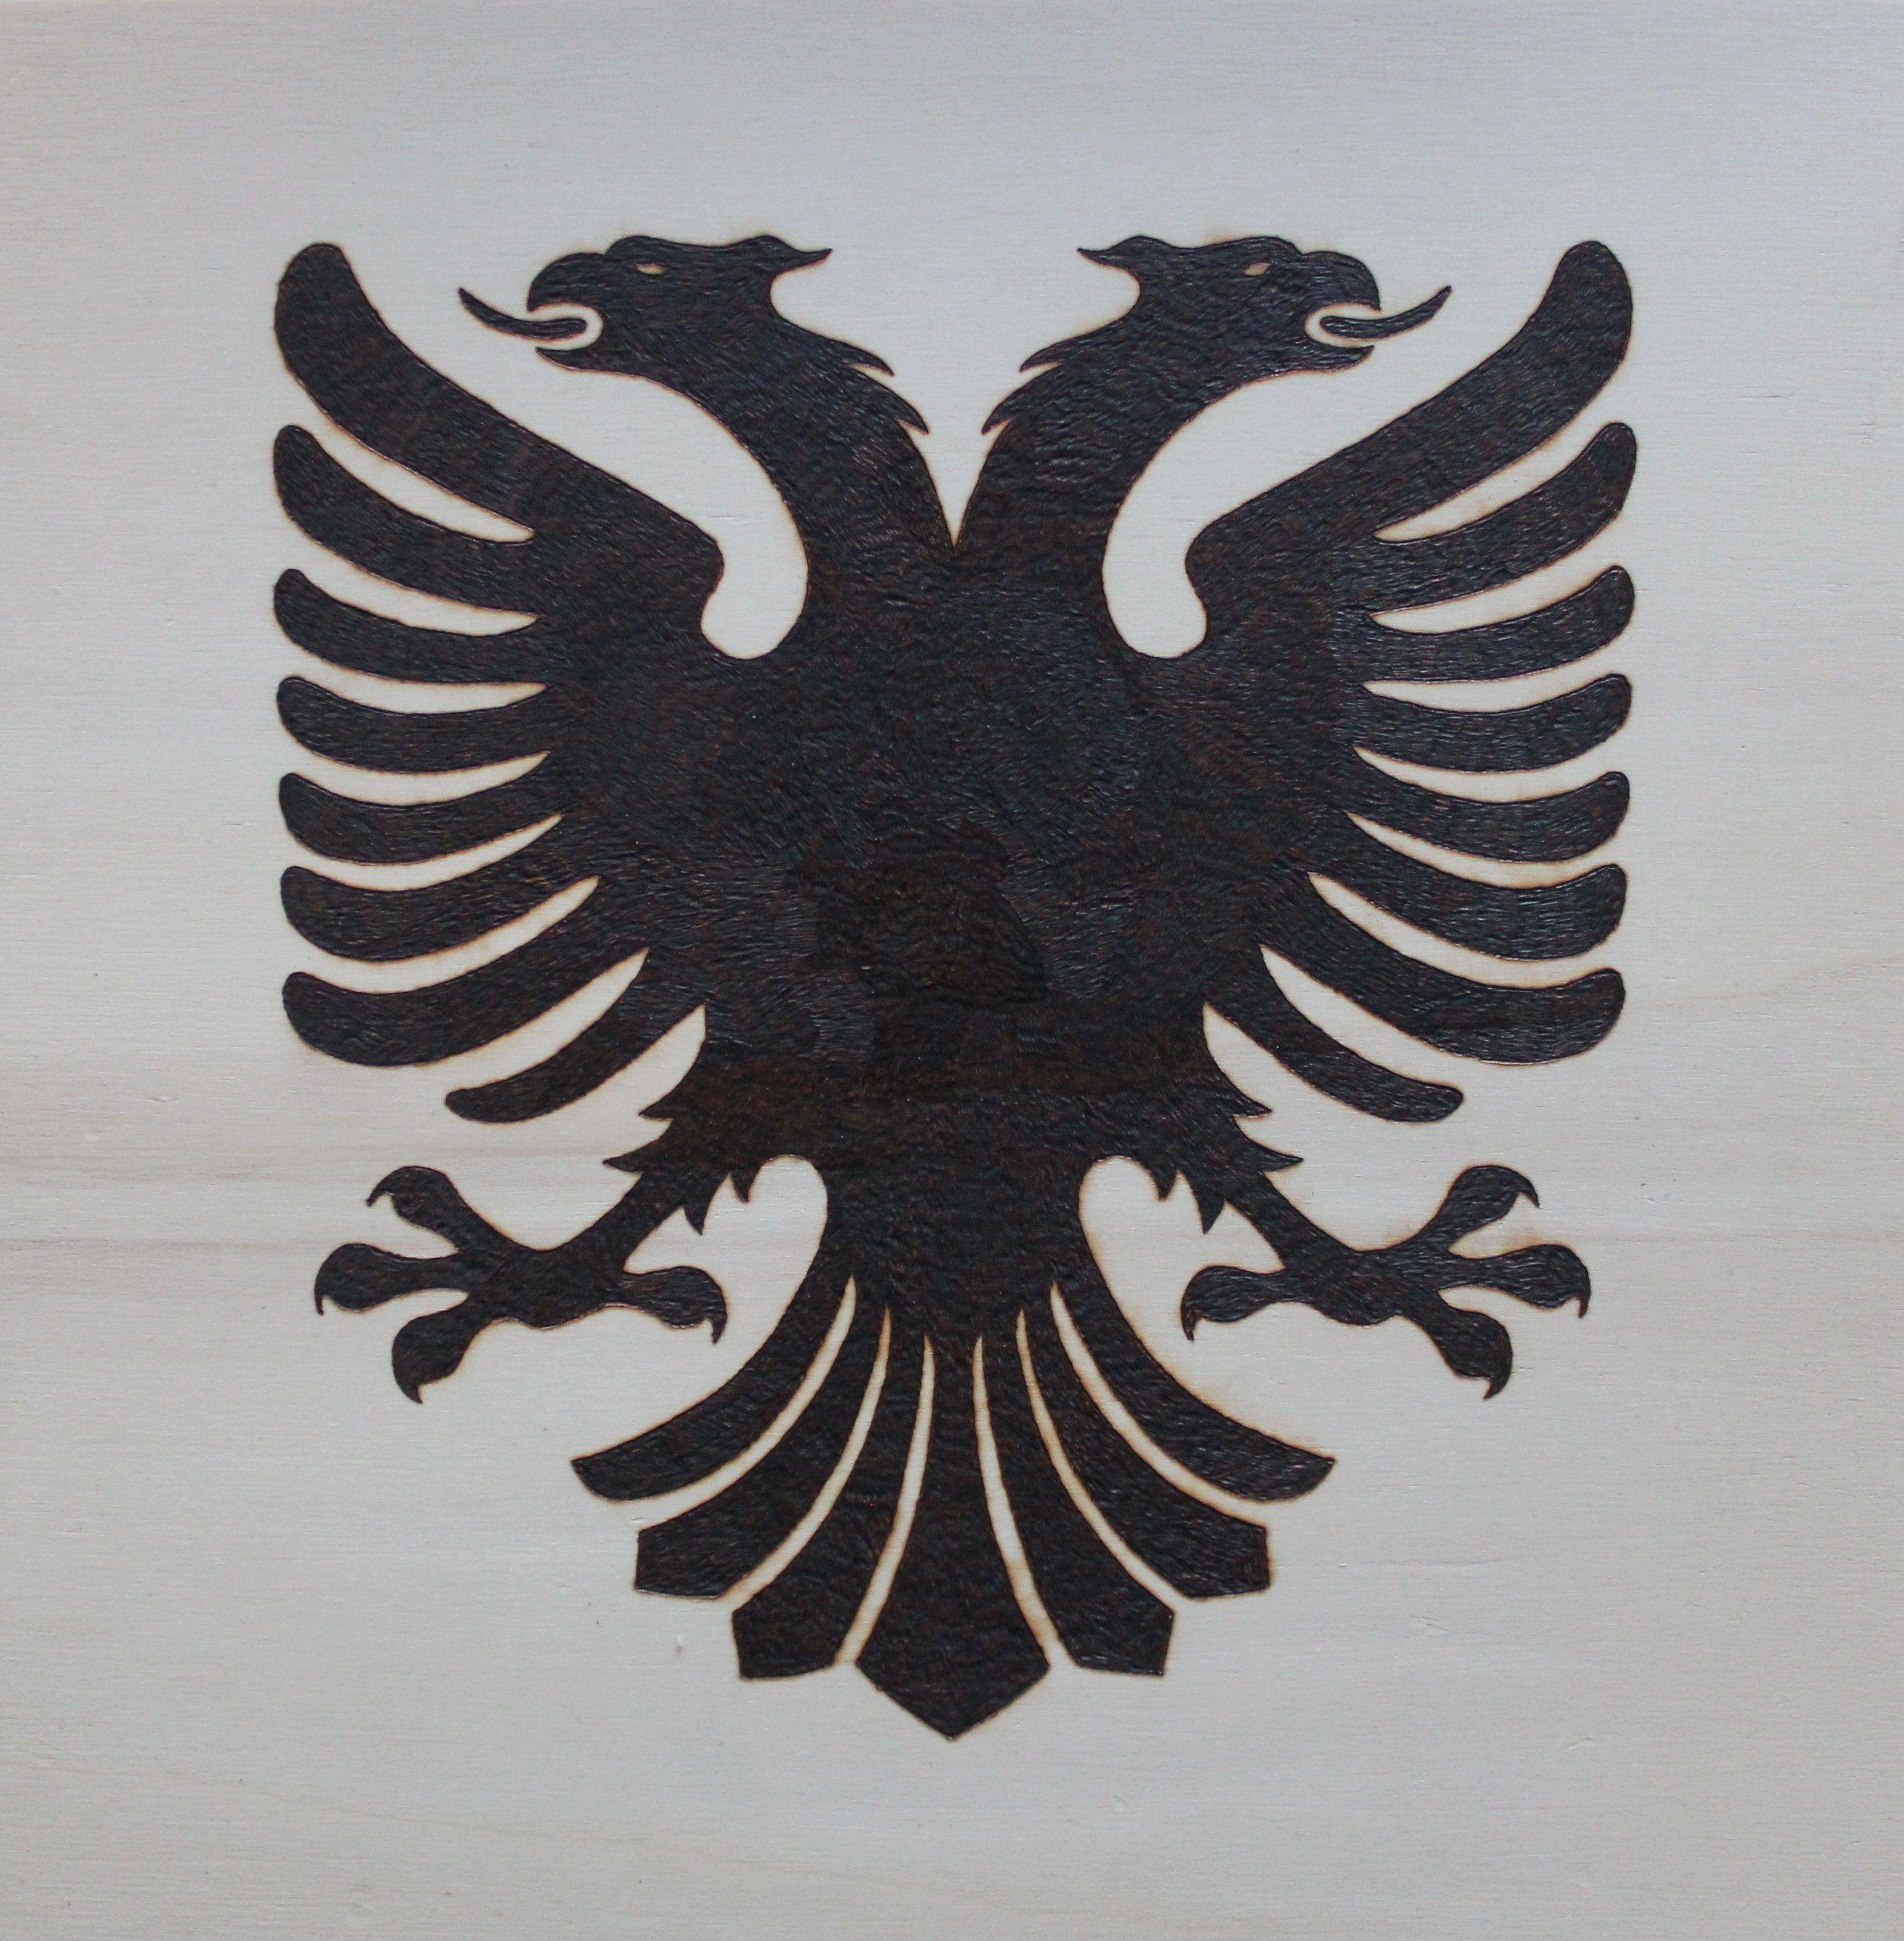 Albanian Double Headed Eagle Vinyl Decal Stickers Vinyl Decals Custom Vinyl Decal